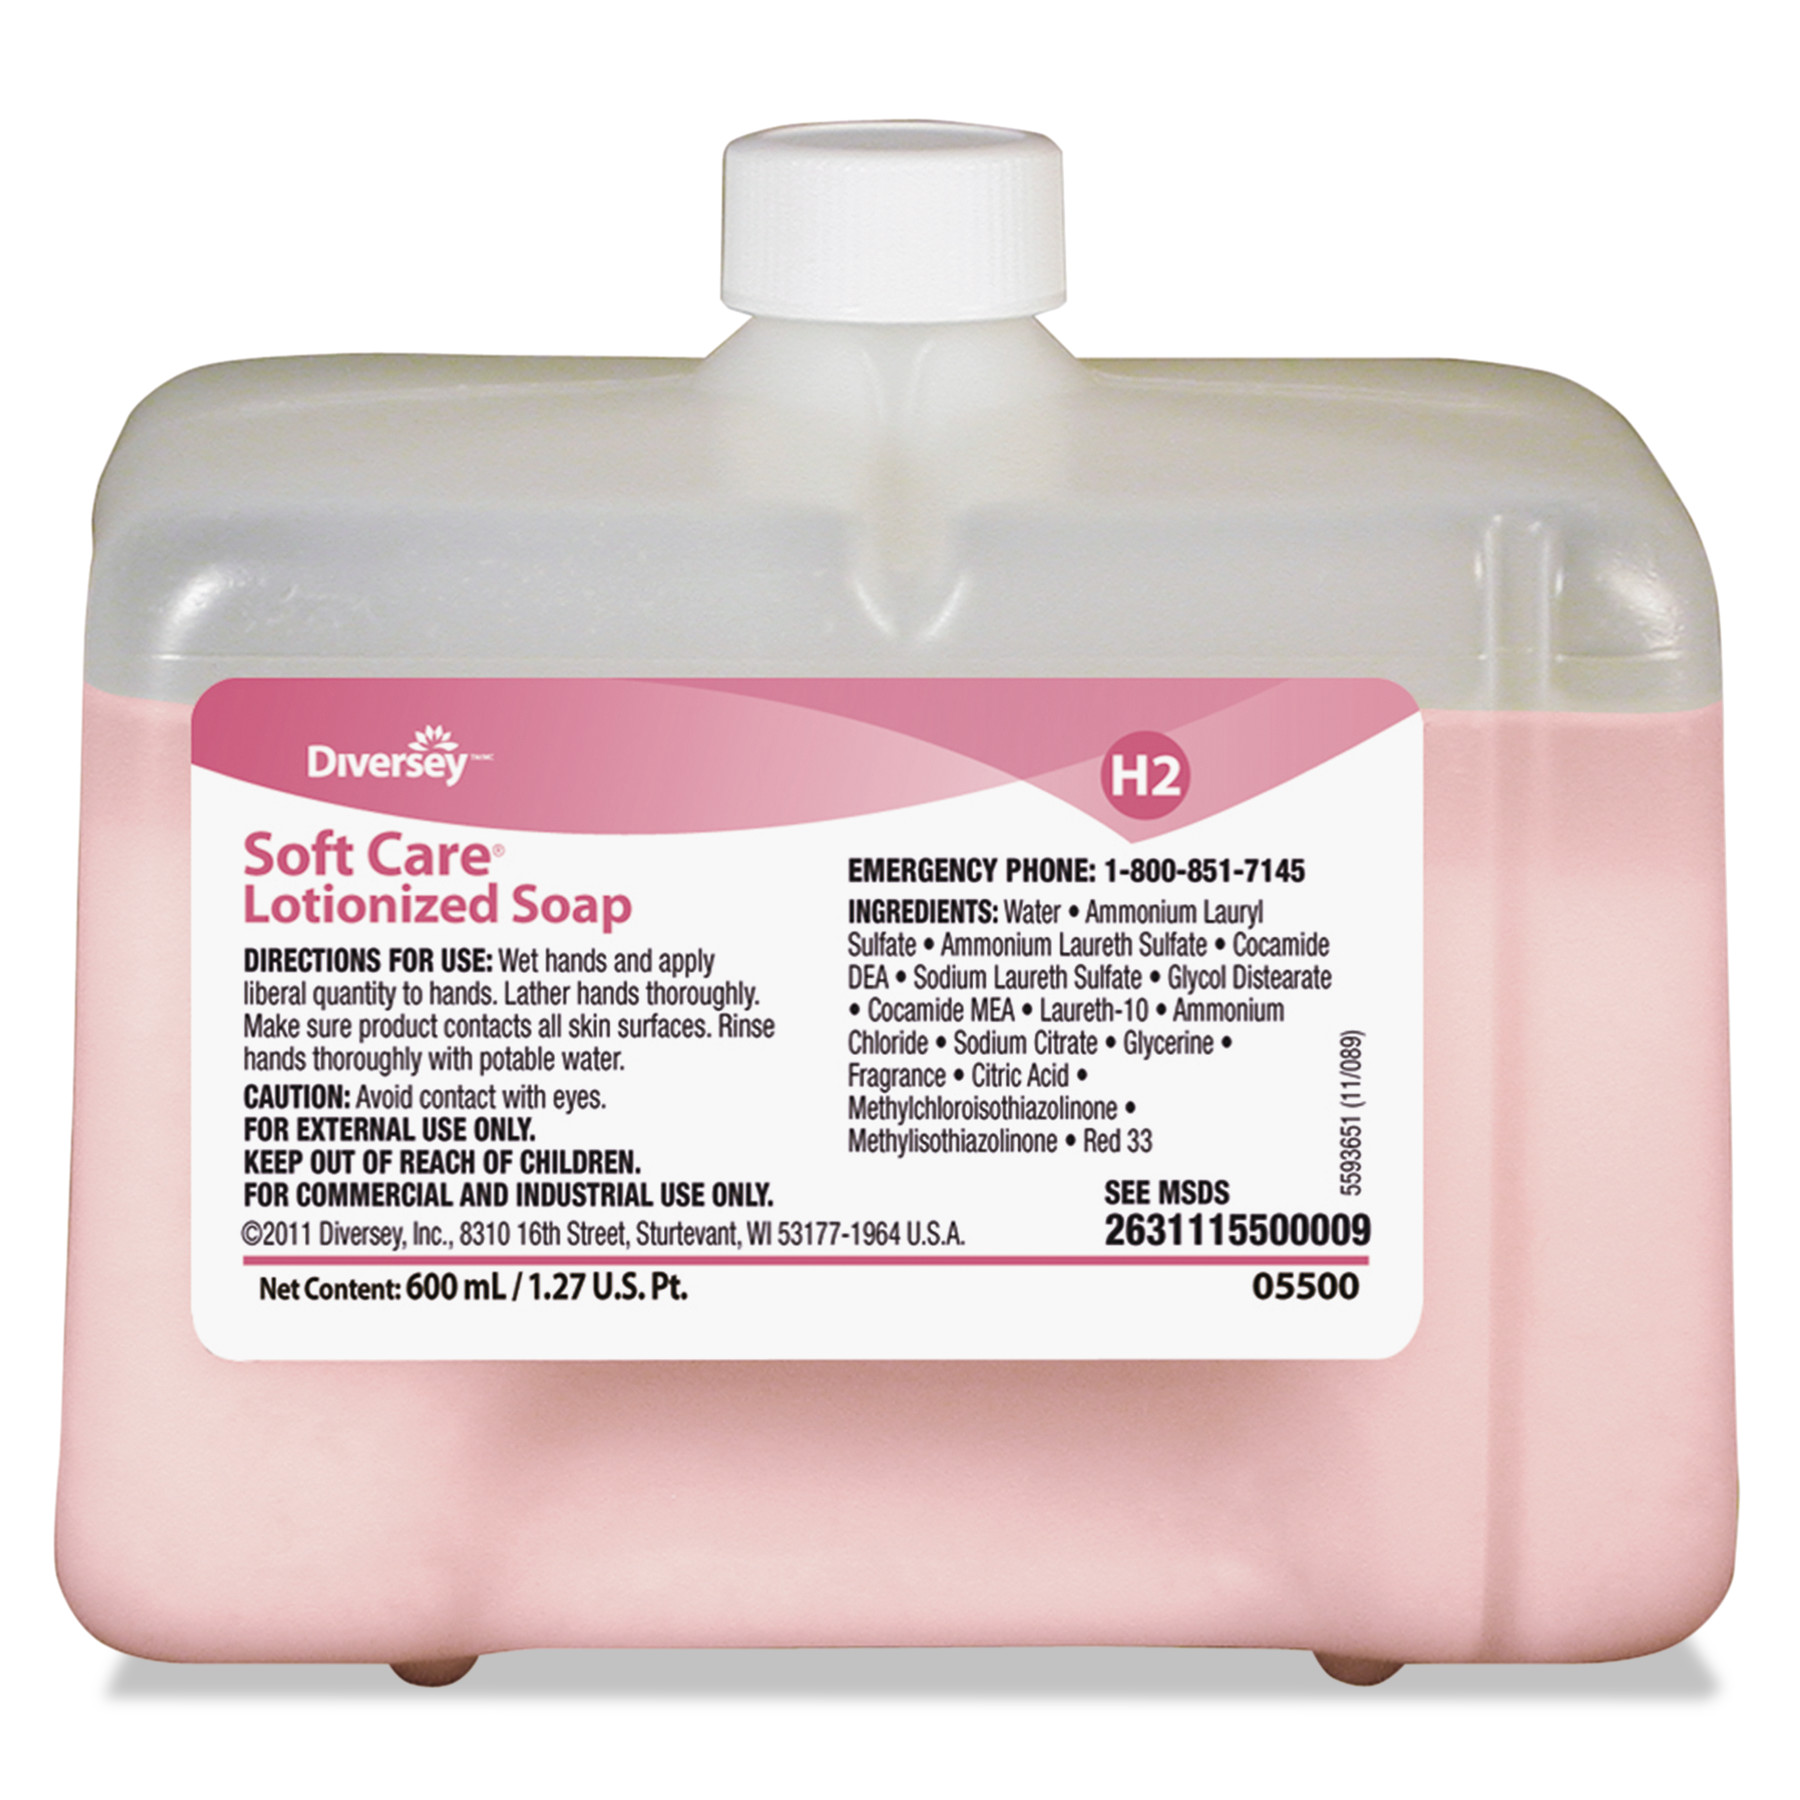 Diversey Soft Care Lotionized Hand Soap, 600 mL Cartridge, Floral Scent, 12/Carton